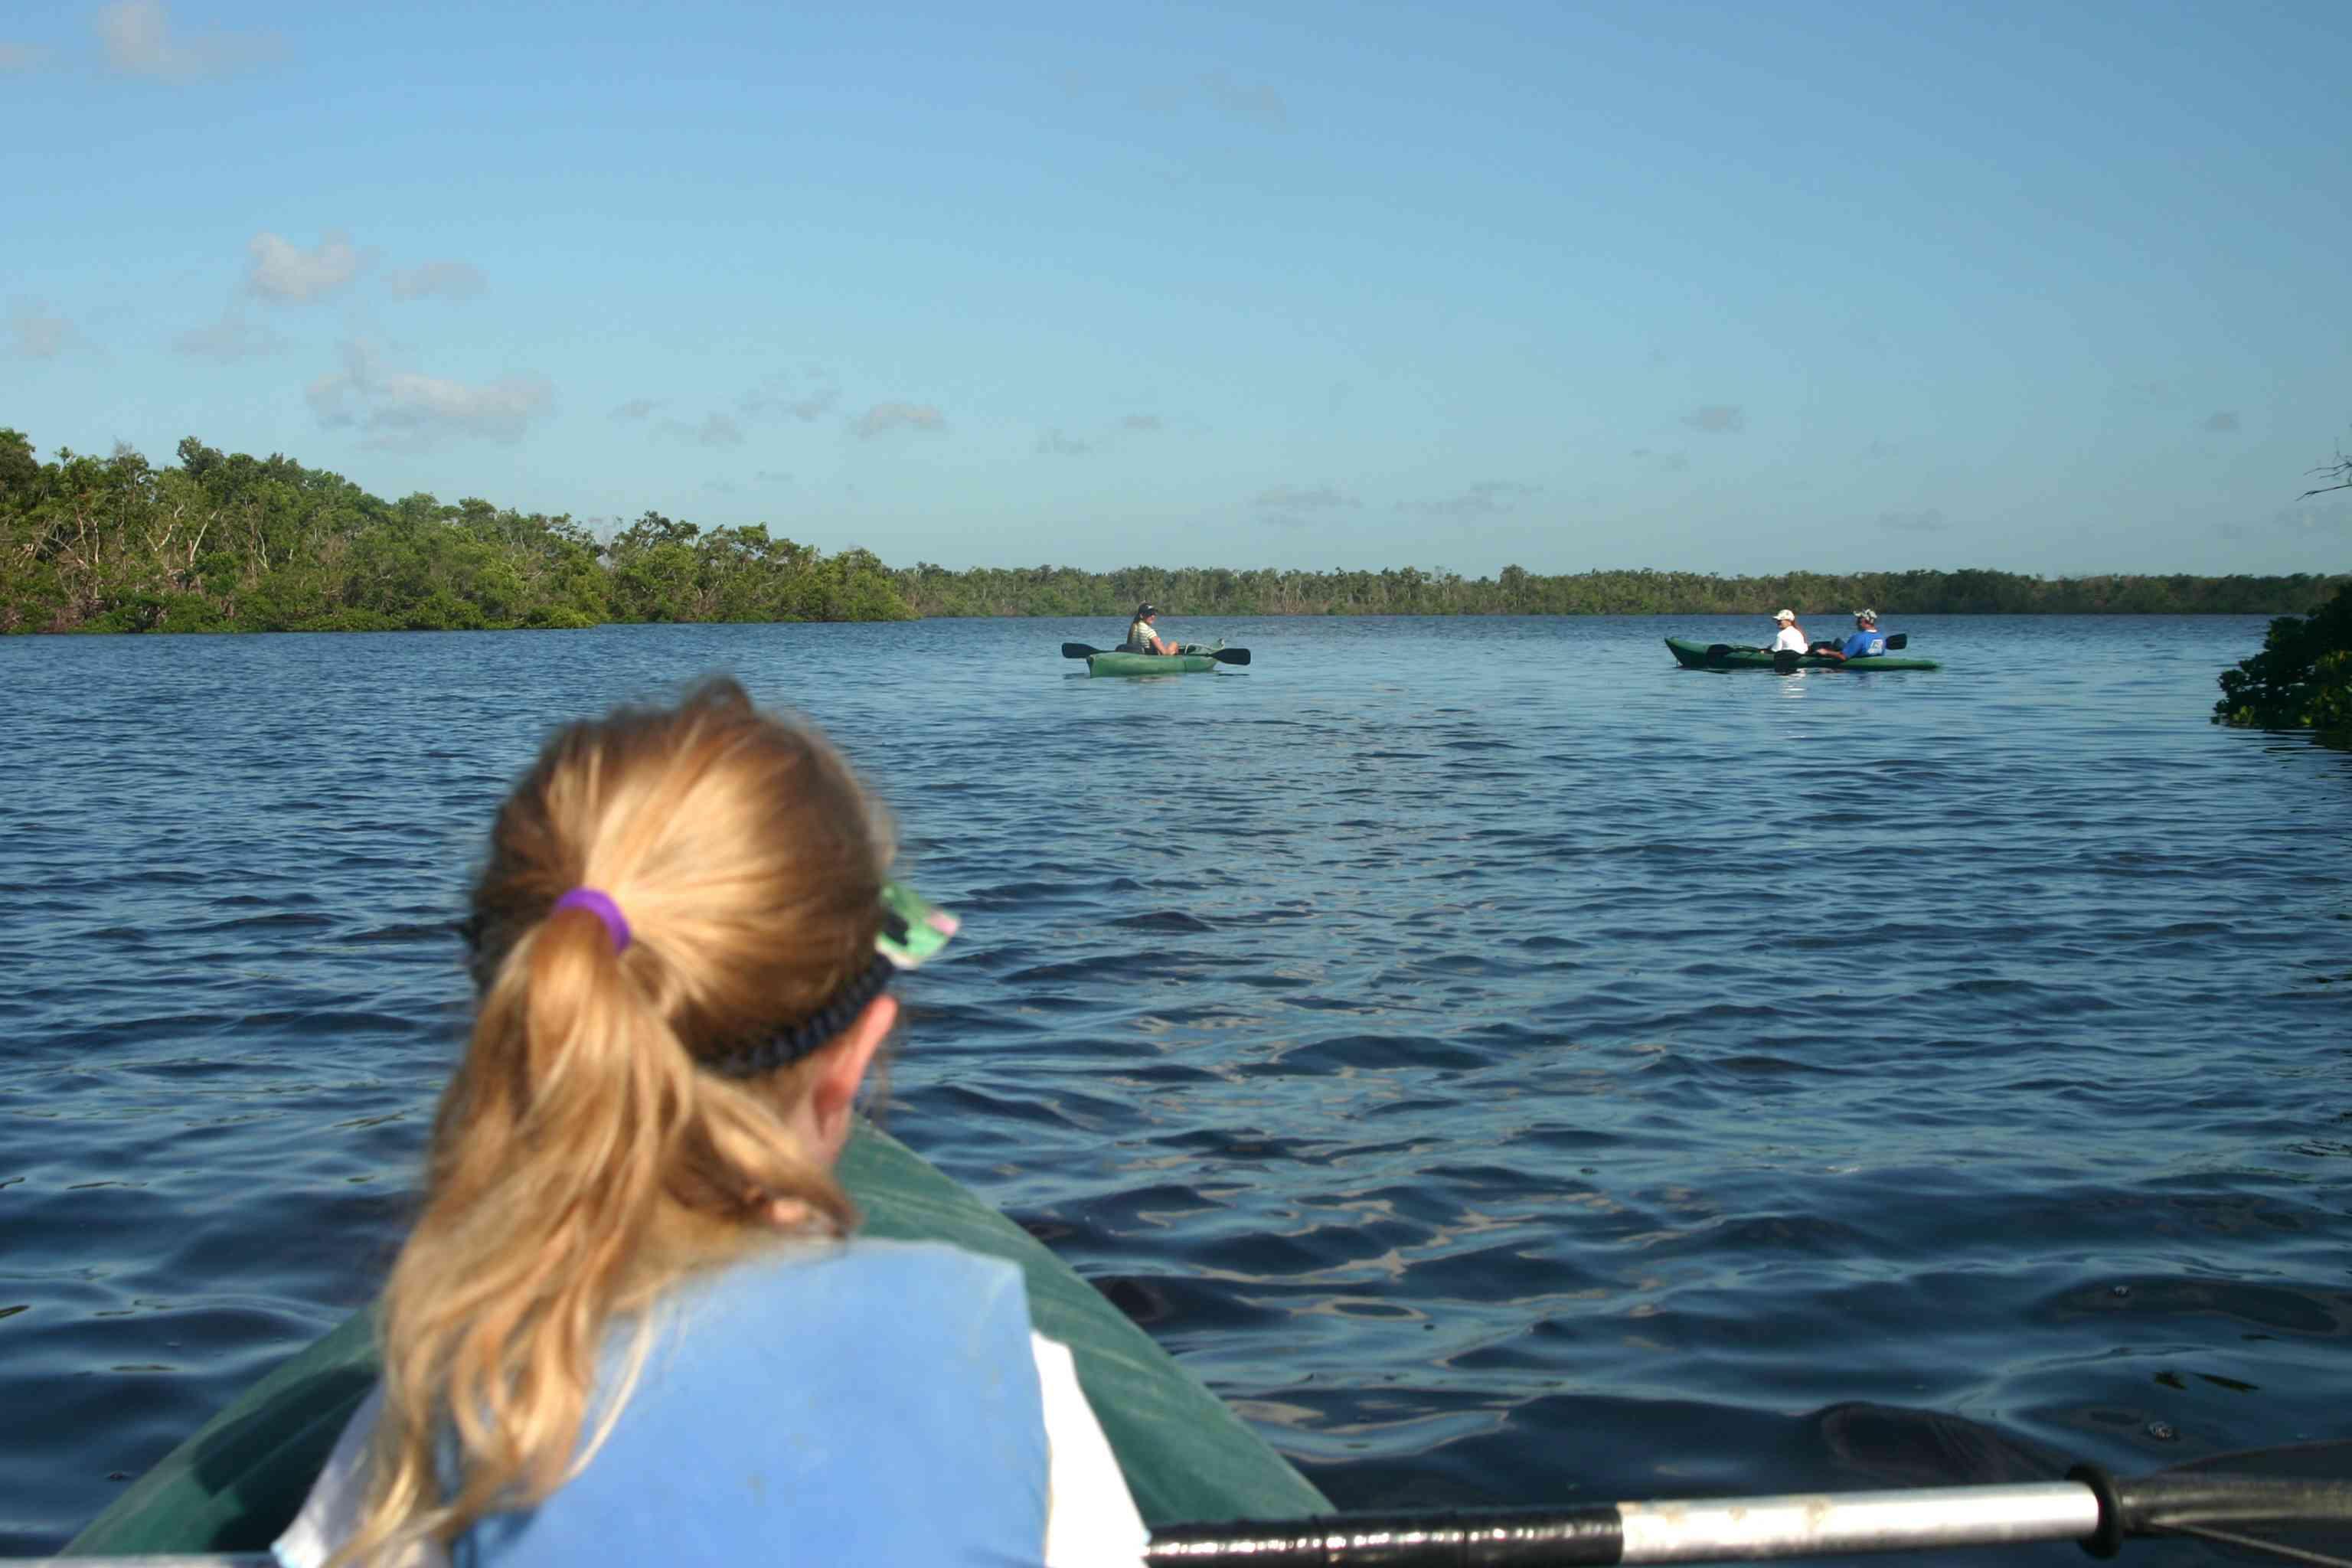 Someone kayaking and looking at other people kayaking off Sanibel Island